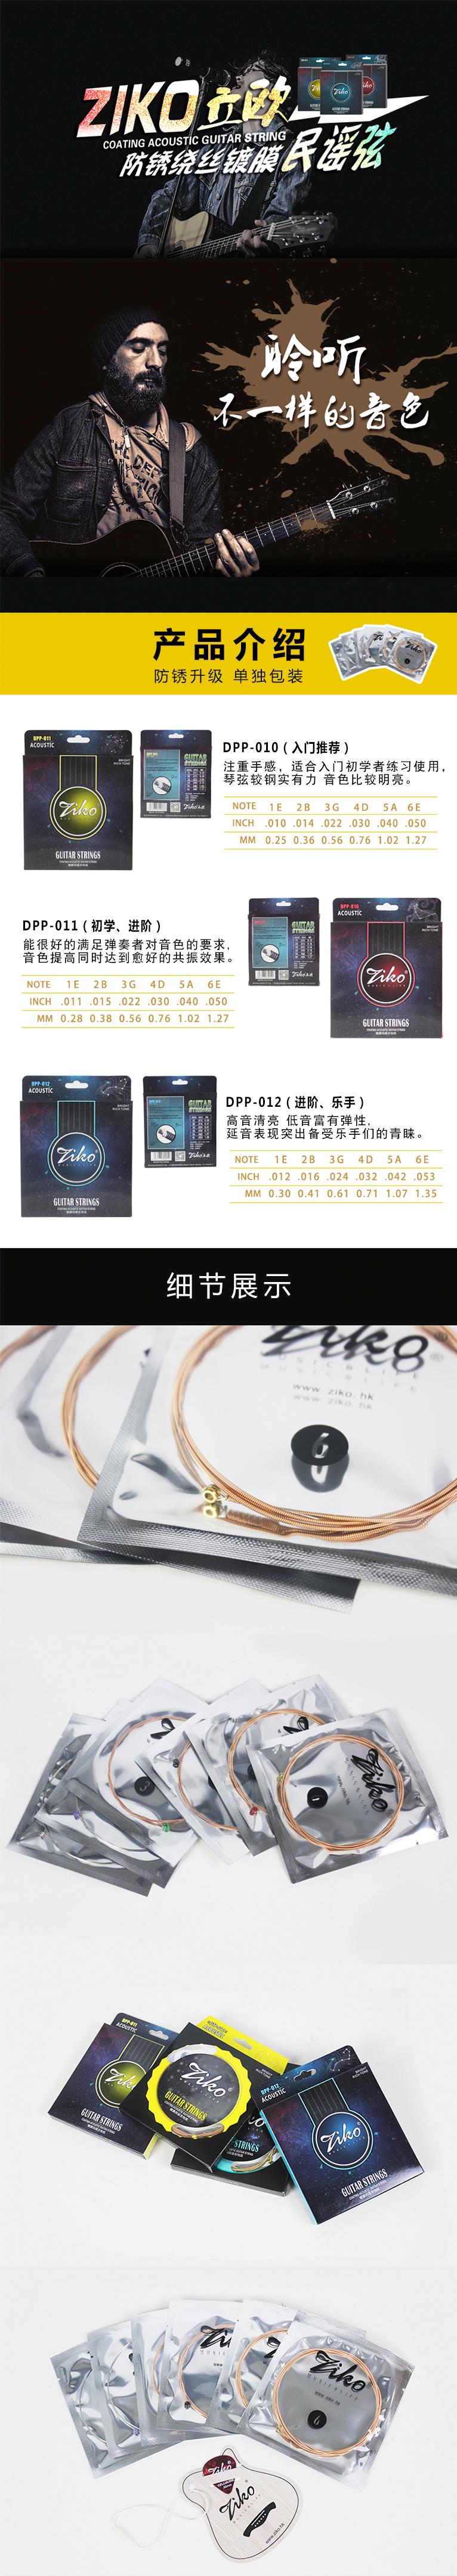 DPP改字体.jpg